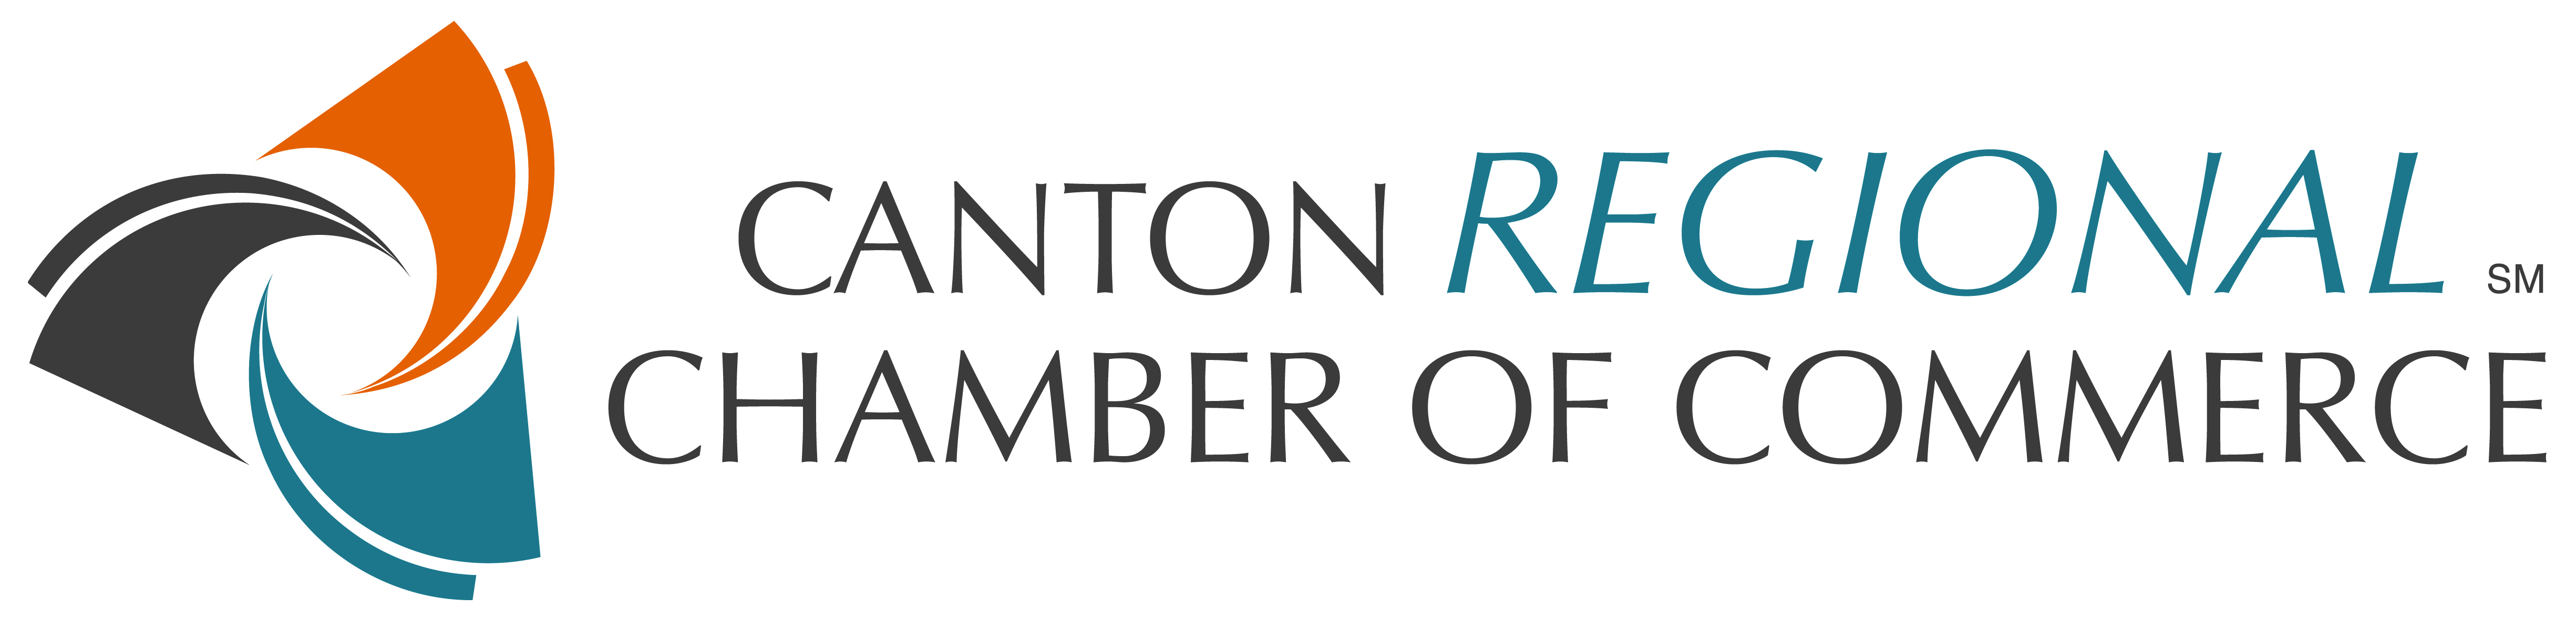 Canton Regional Chamber logo